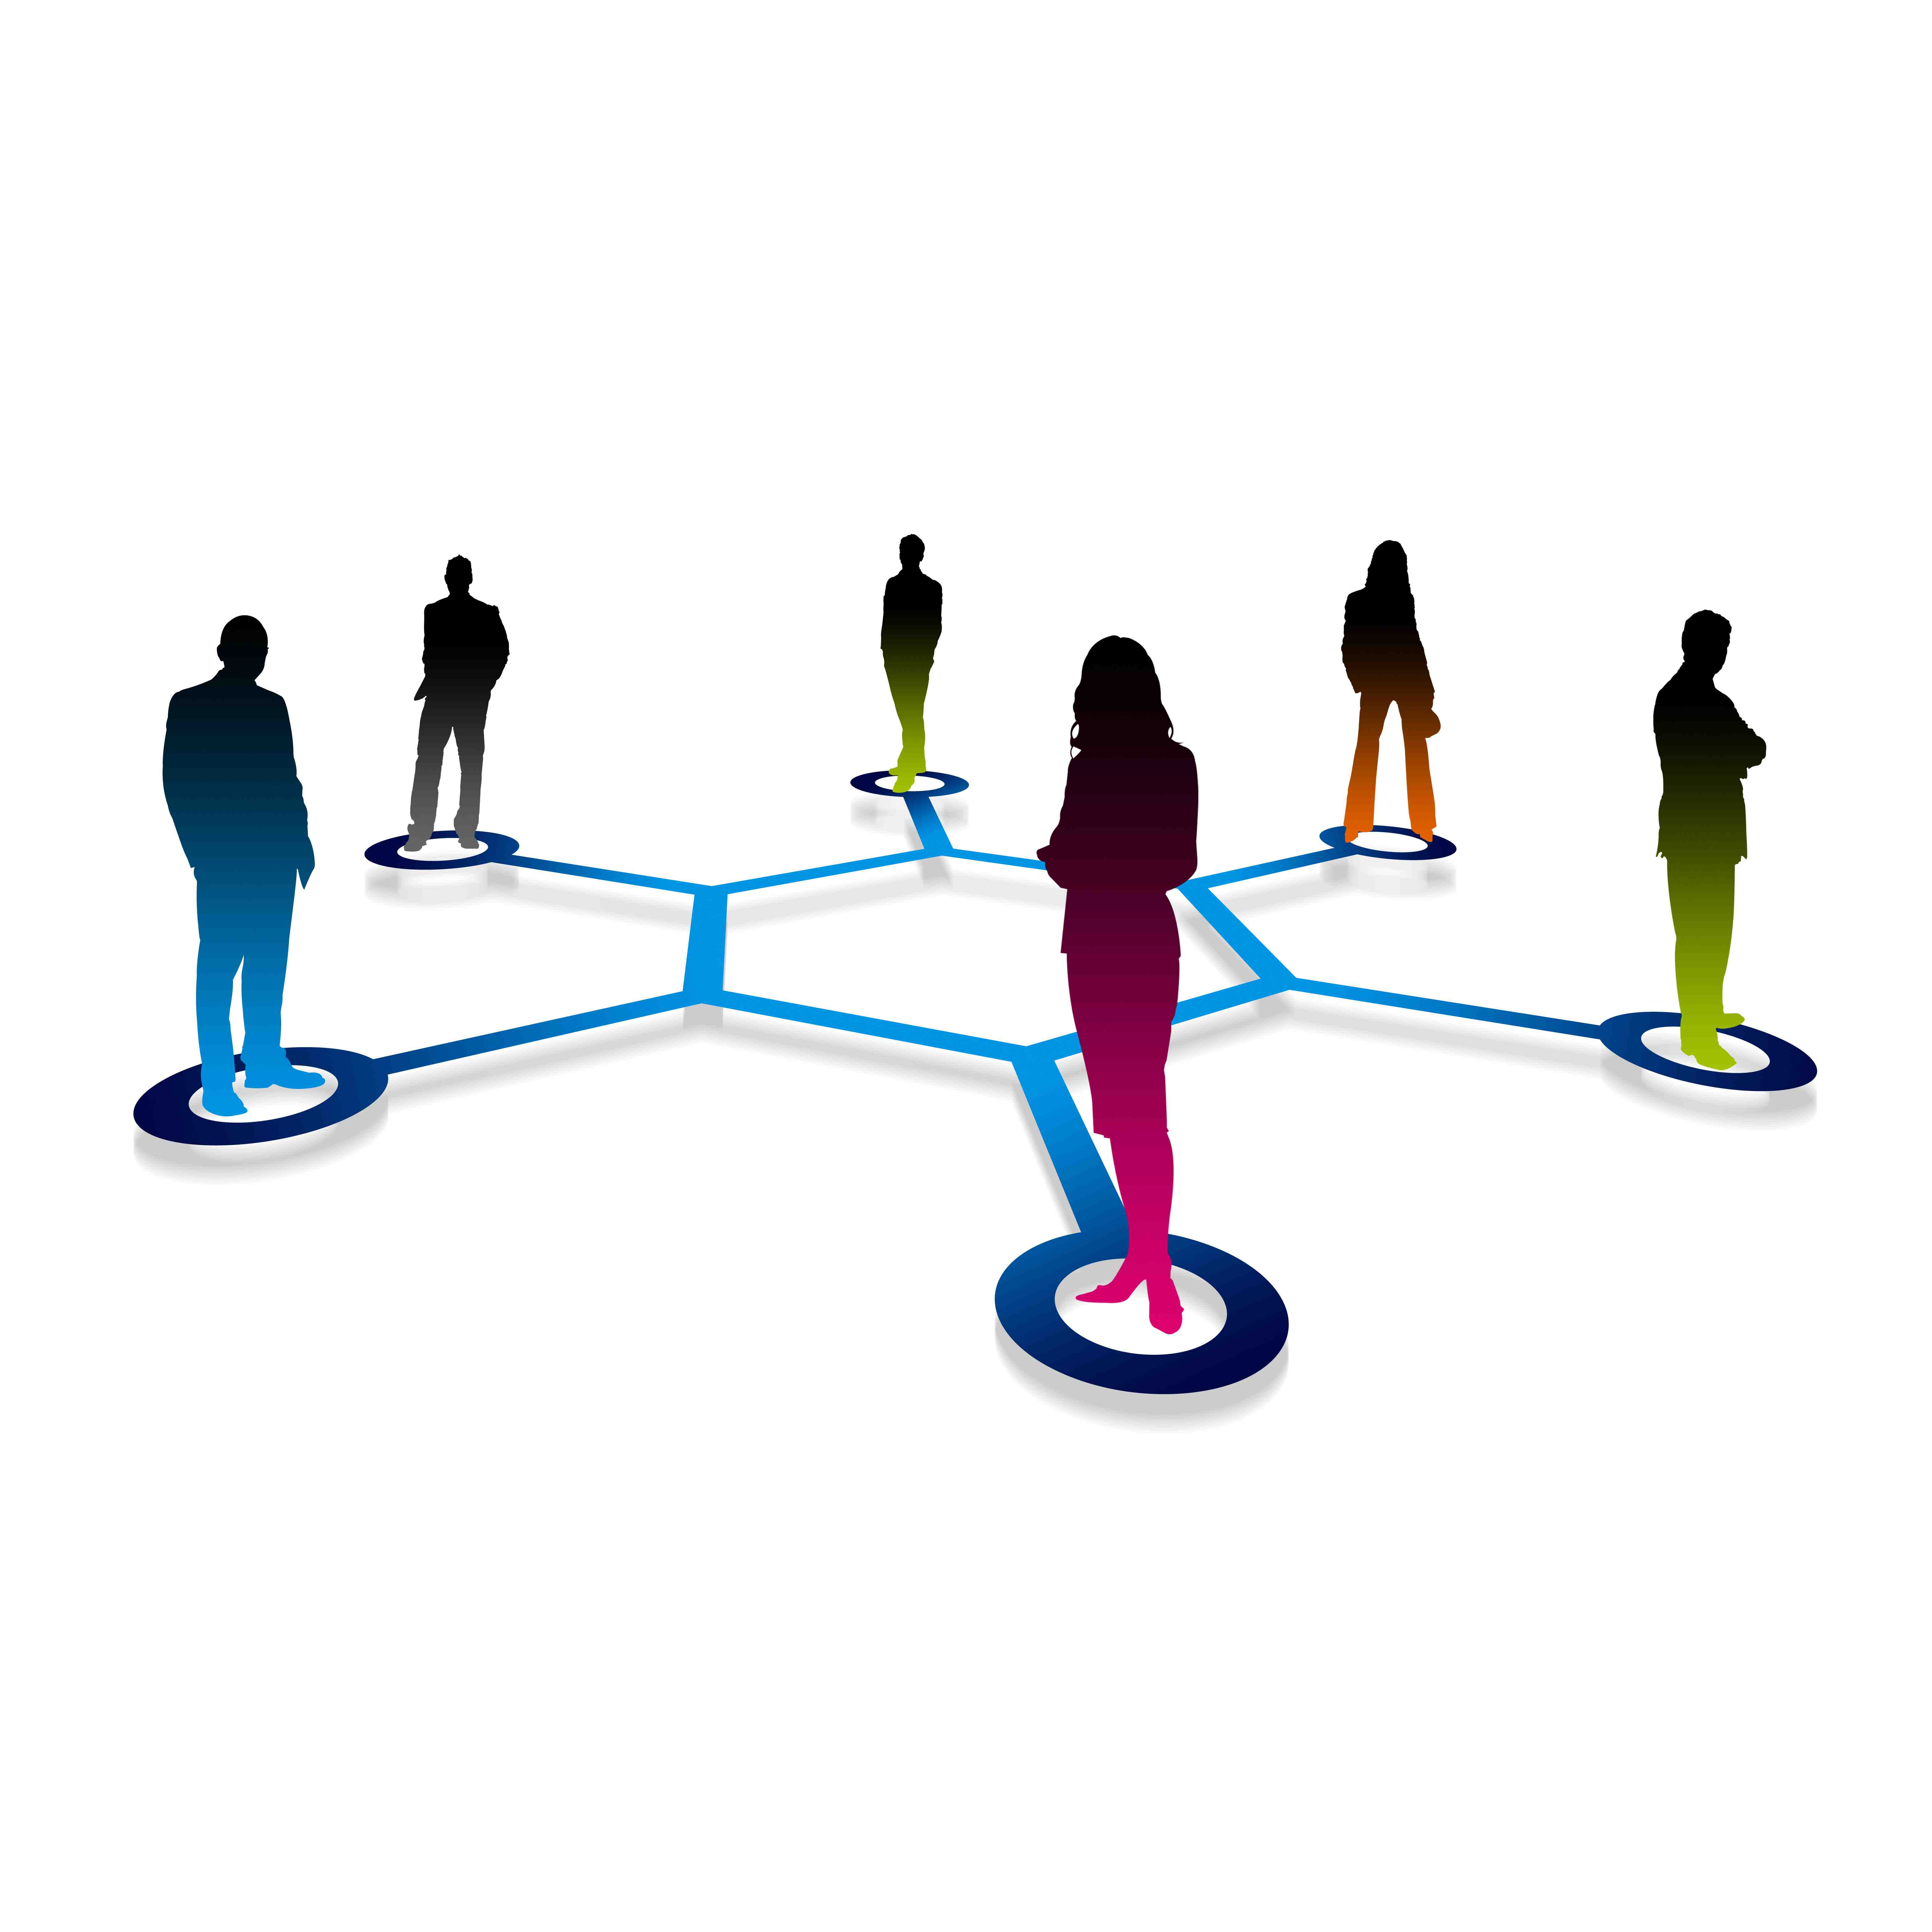 Socially Connected, via The Myndset Digital Marketing and Branding